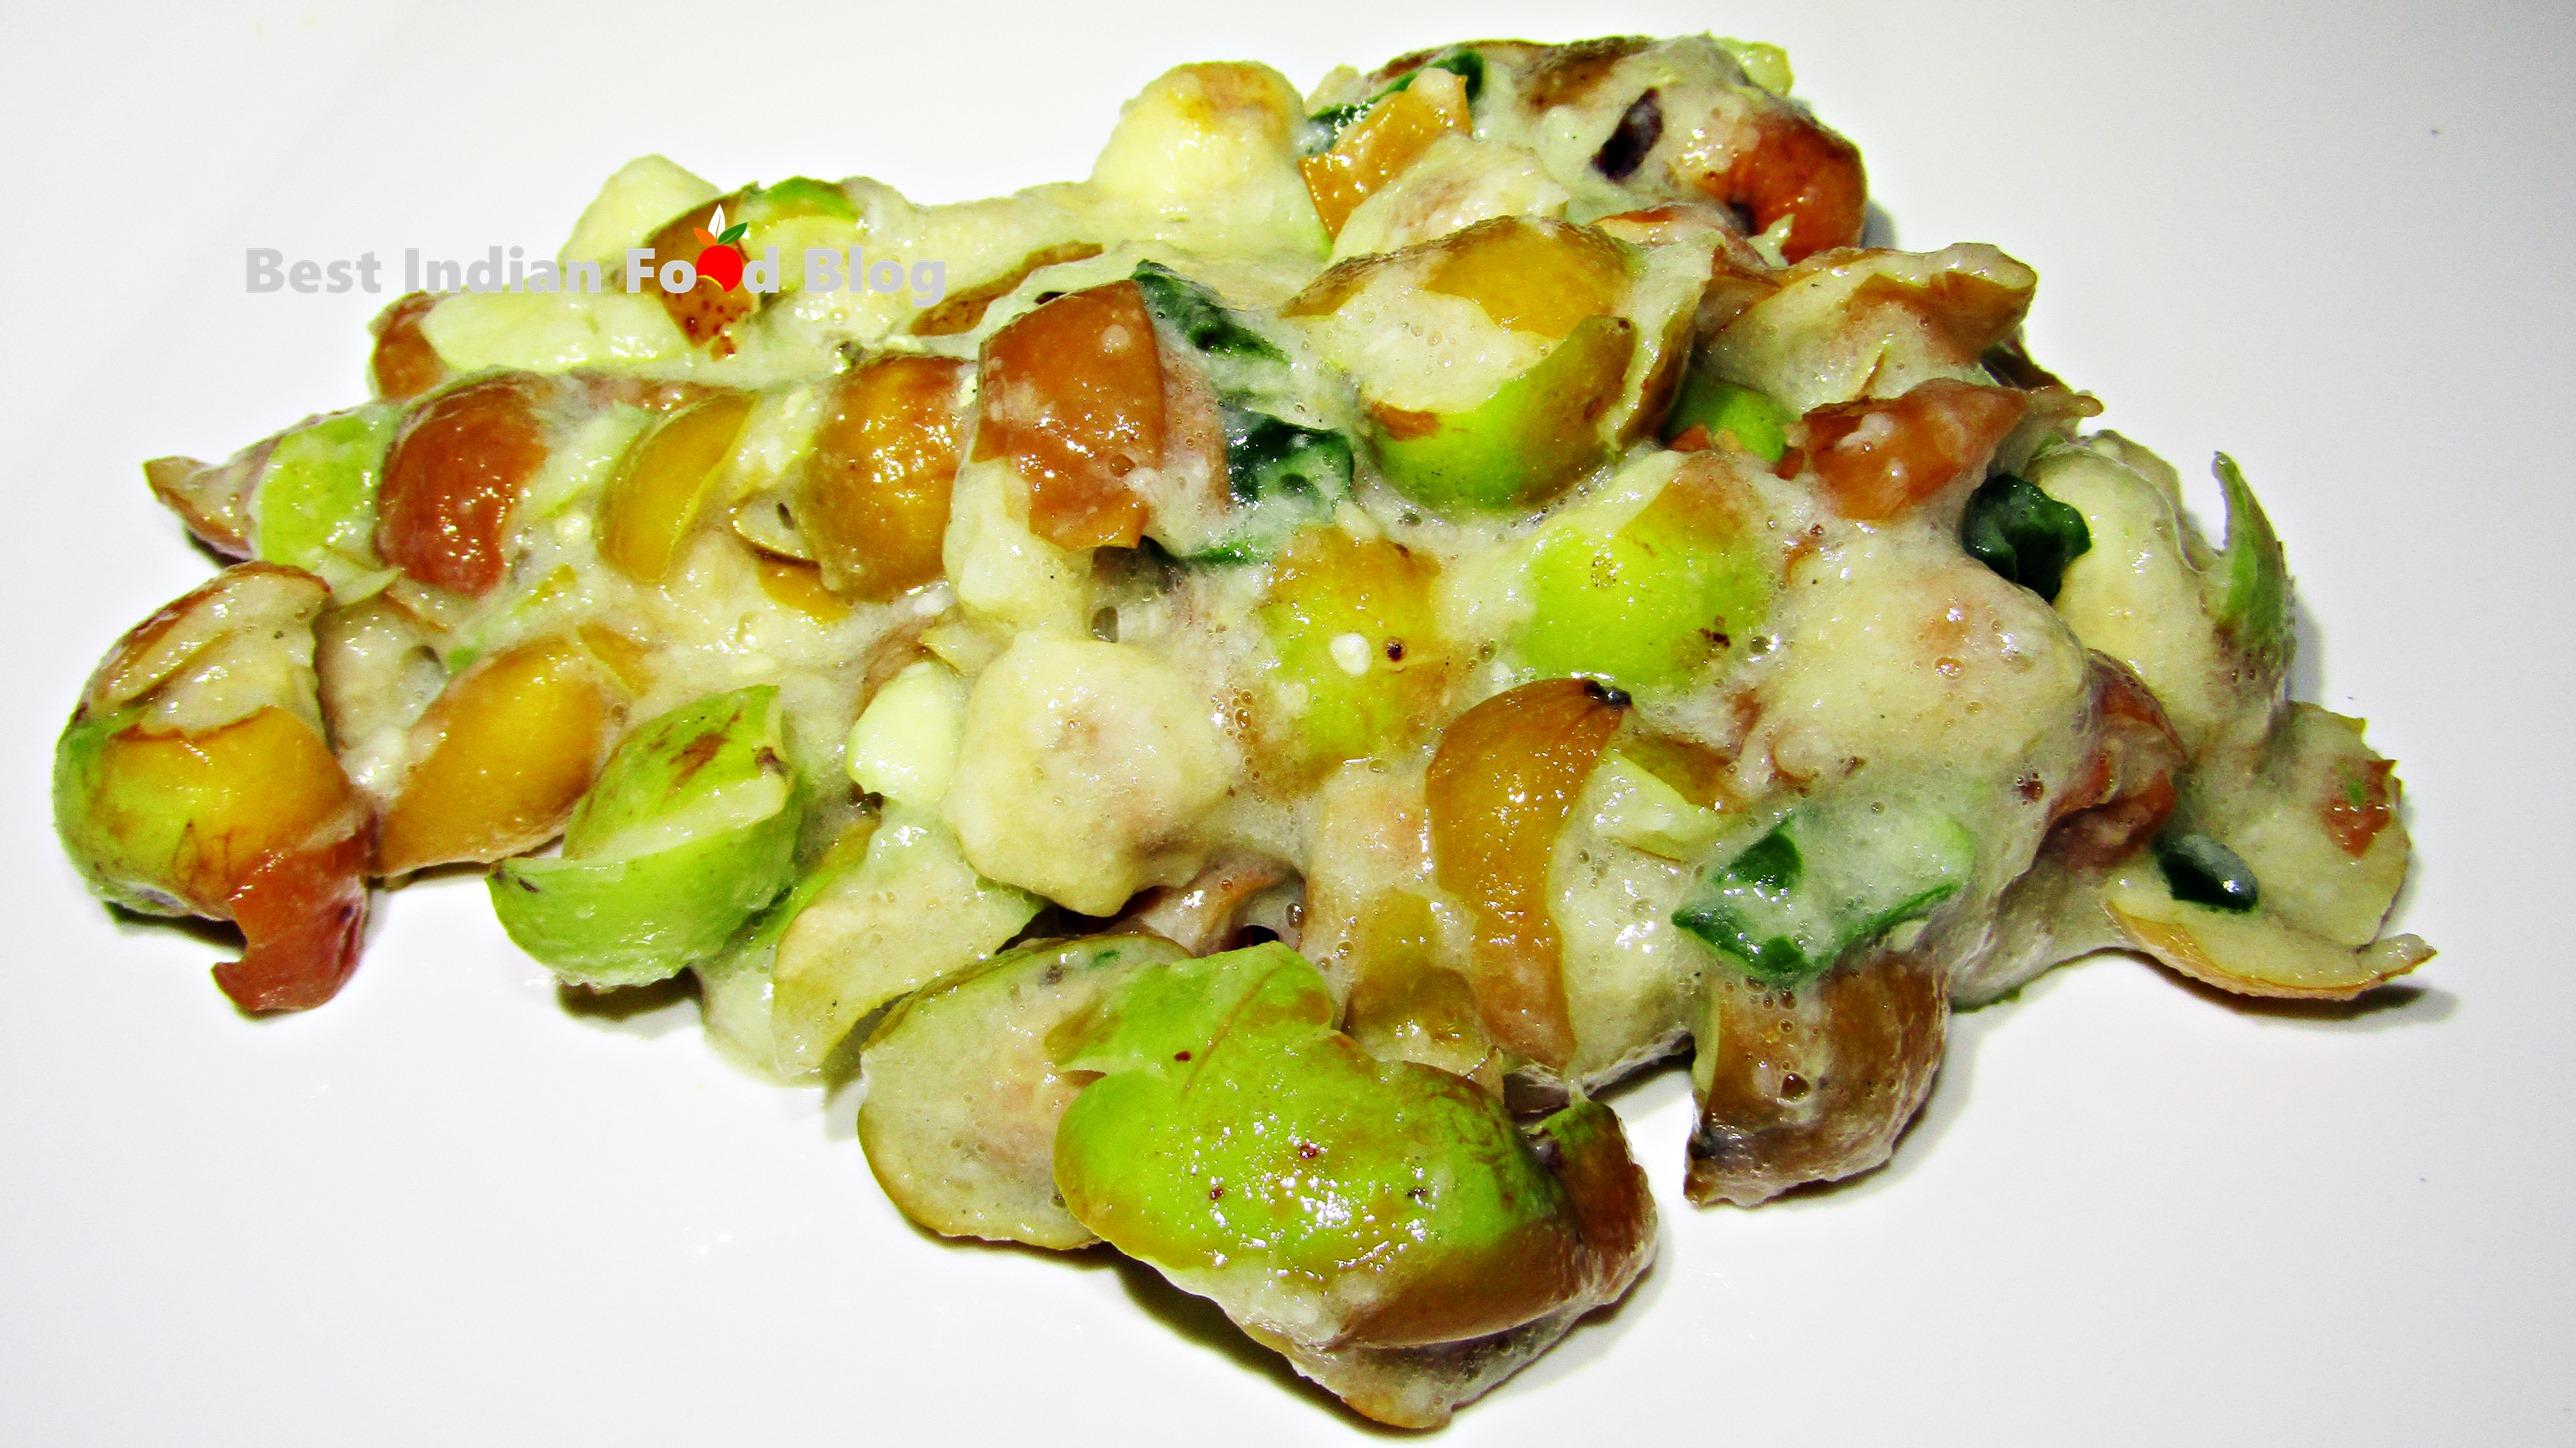 Kul Makha from West Bengal, India | Best Indian Food Blog | Jujube recipe